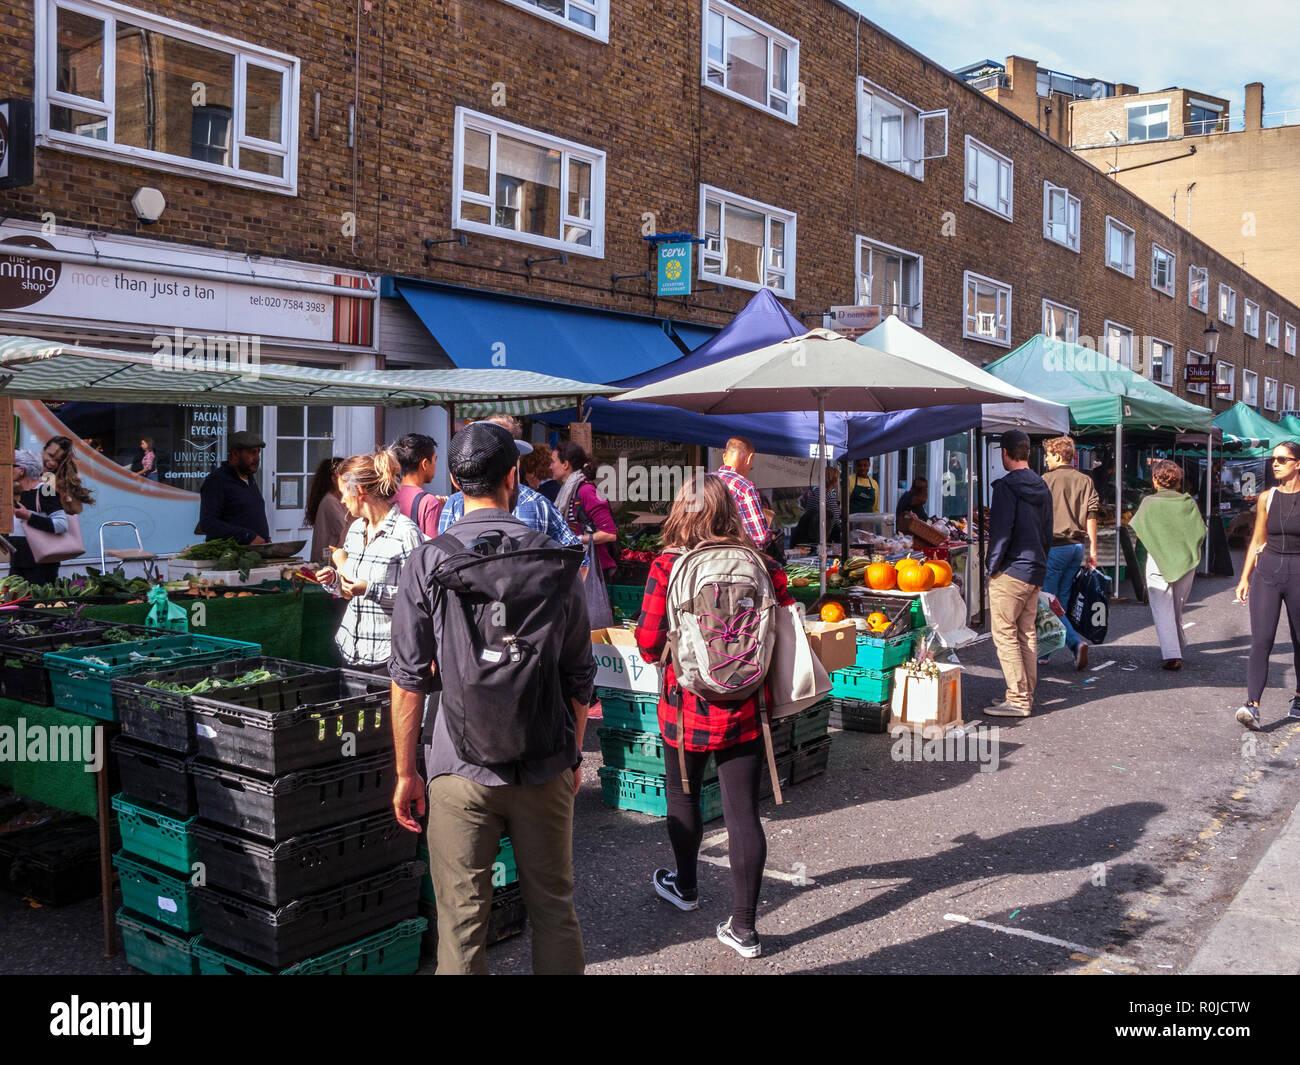 Bute Street Farmers' Market, South Kensington, London Stock Photo